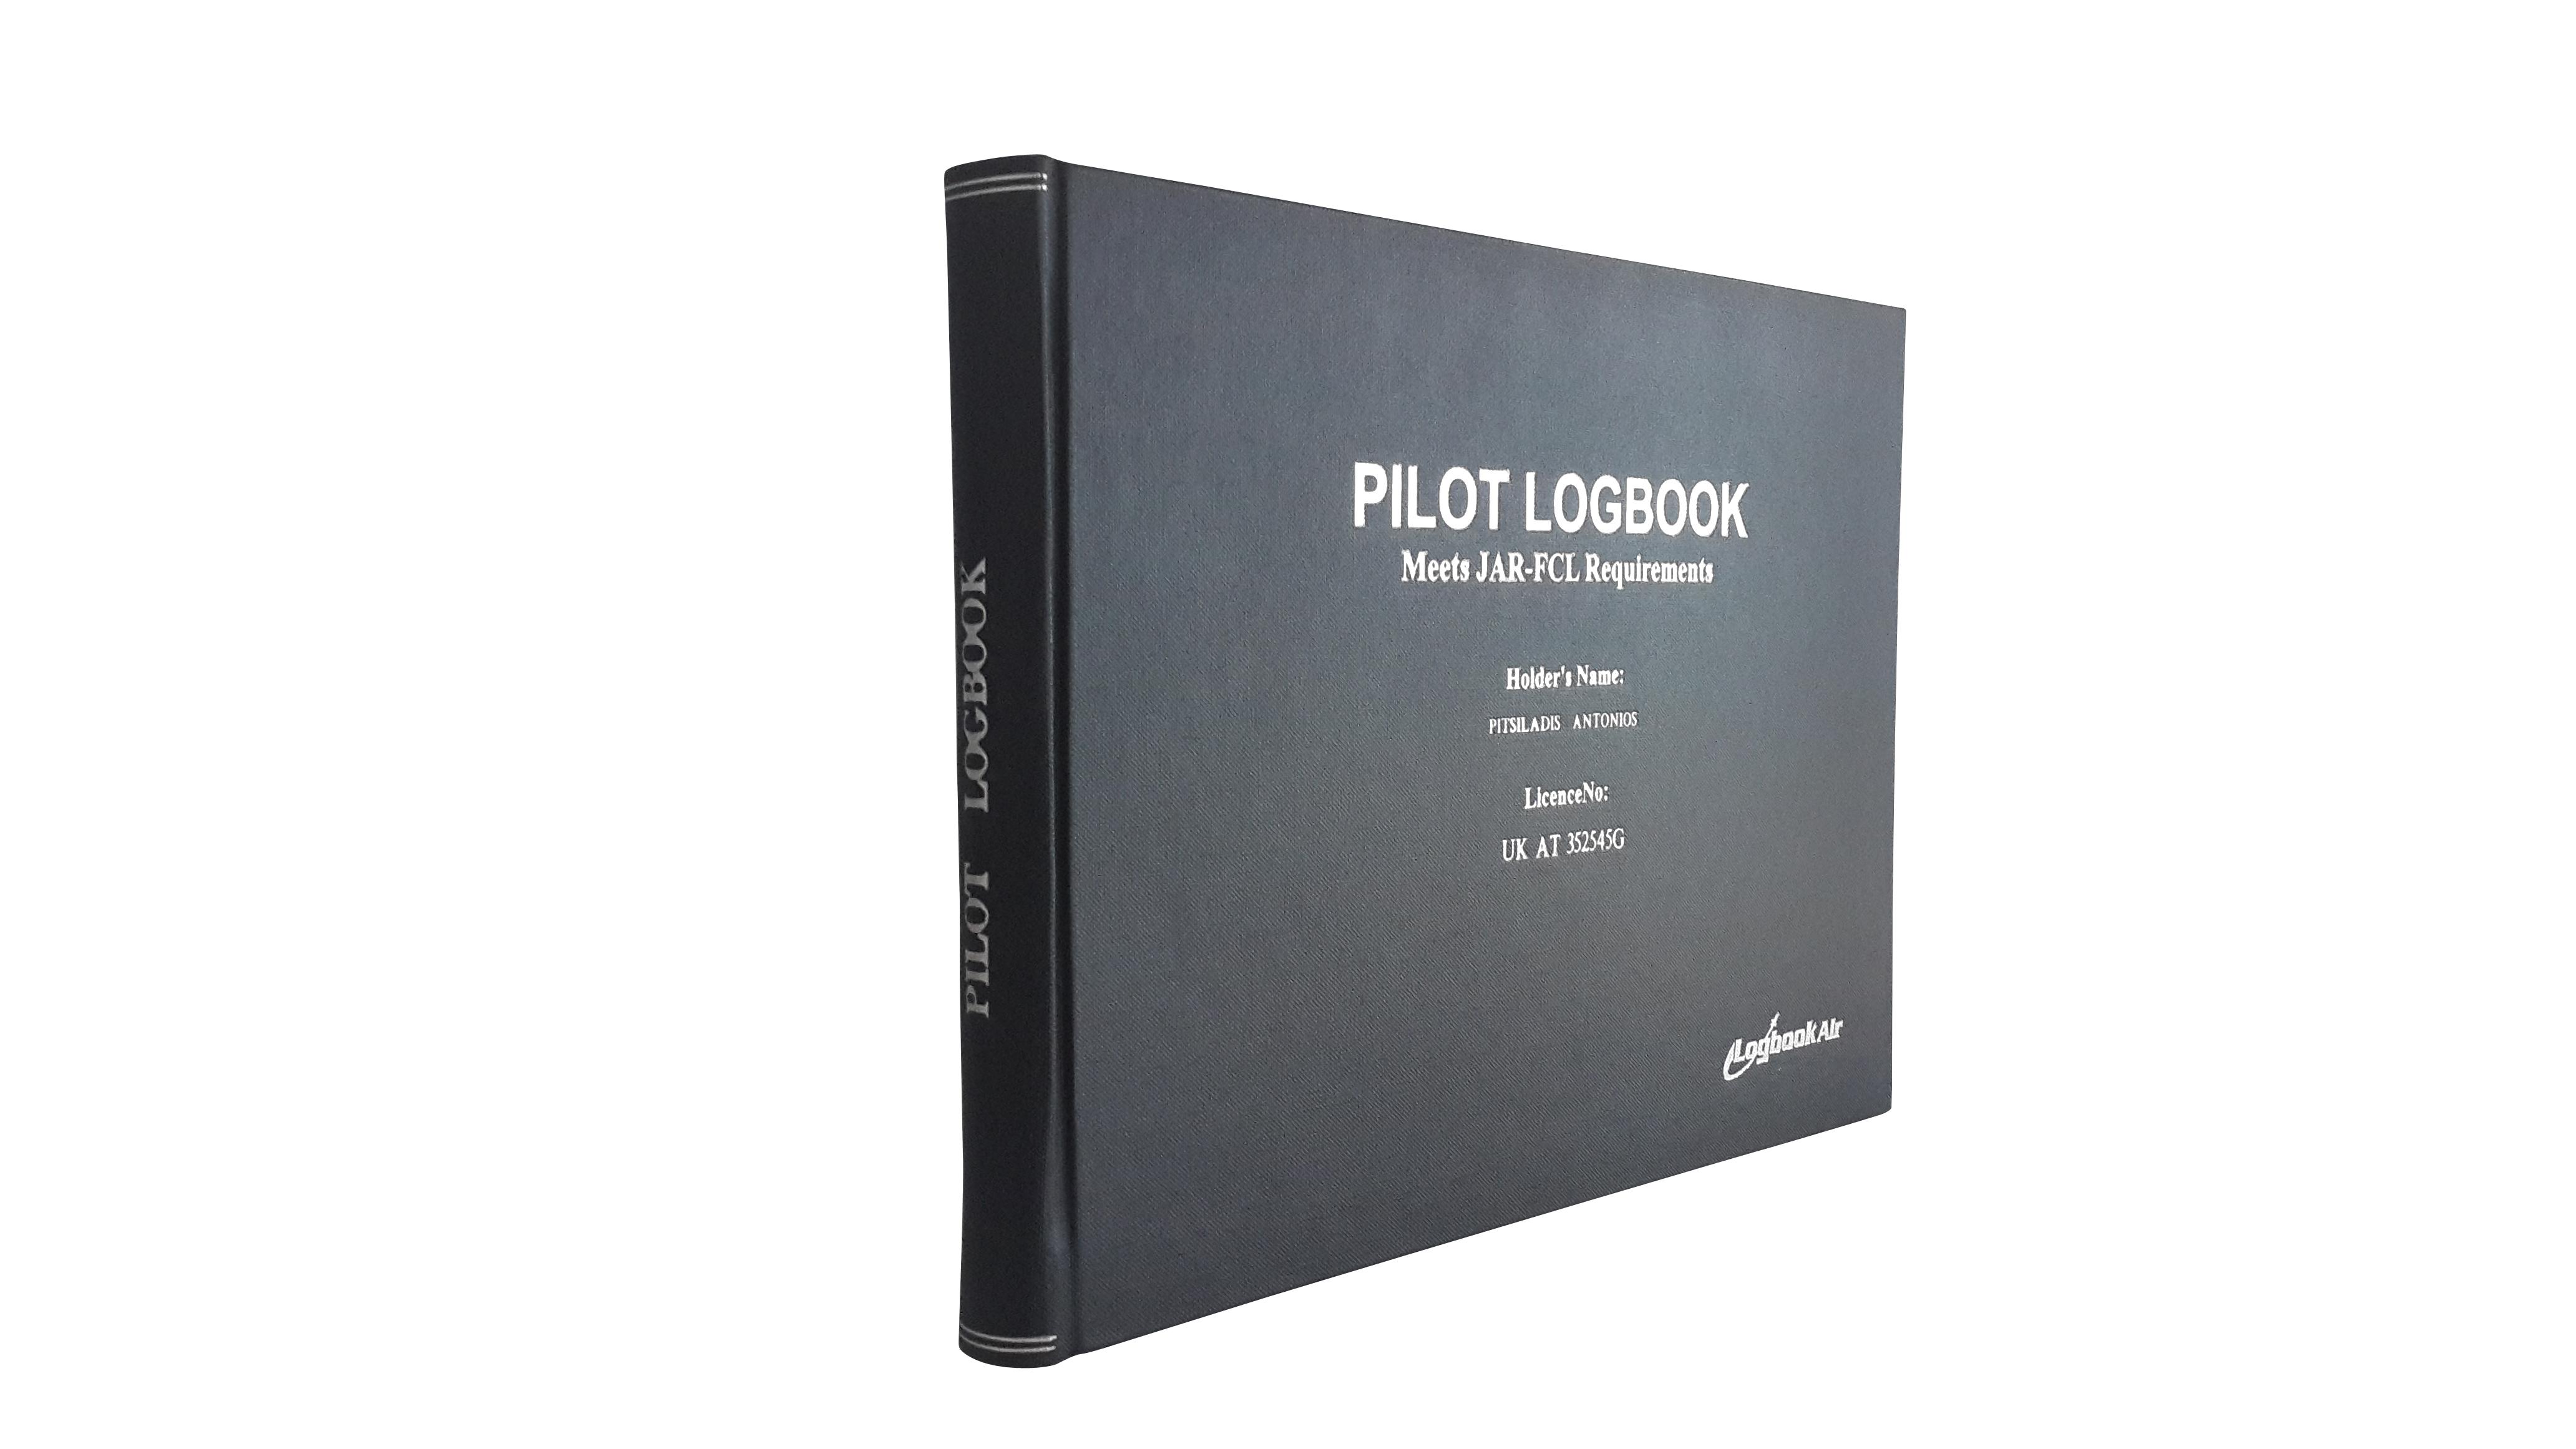 Professional Pilot Logbook by Logbookair